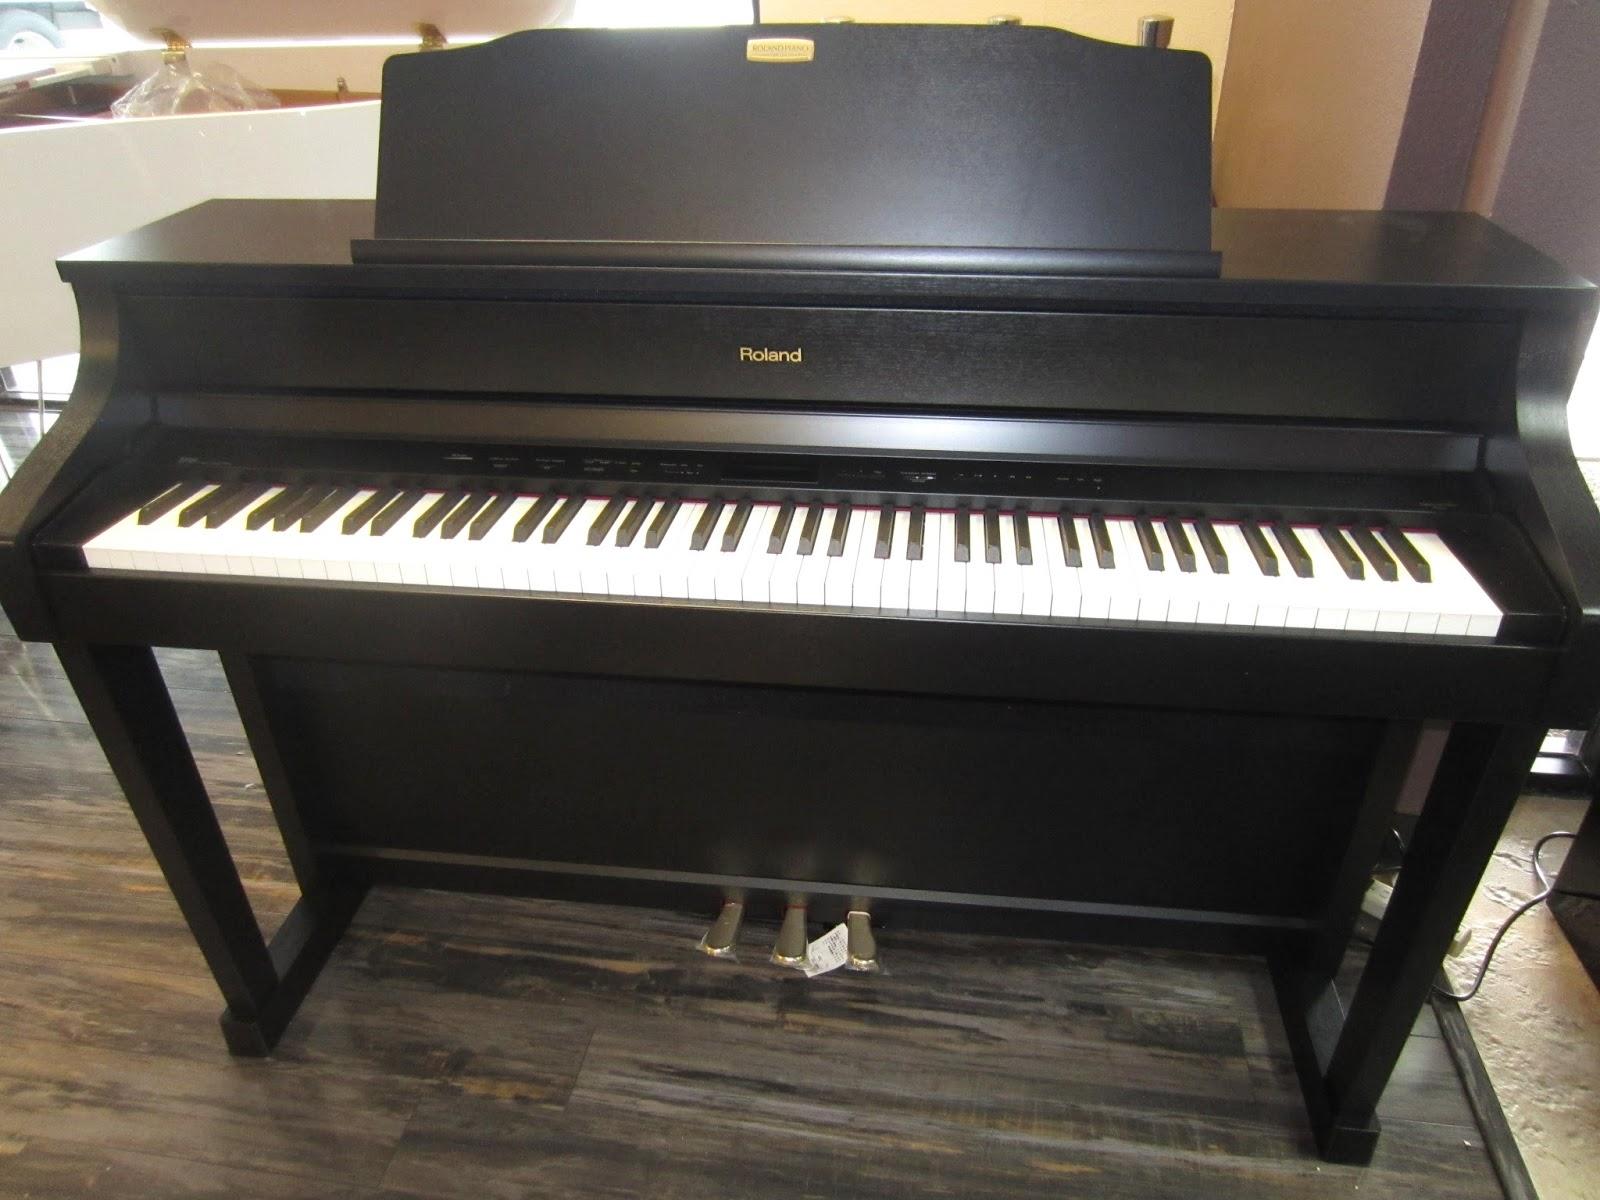 Digital Piano Yamaha Price : az piano reviews new digital pianos lowest after christmas sale prices kawai yamaha ~ Vivirlamusica.com Haus und Dekorationen